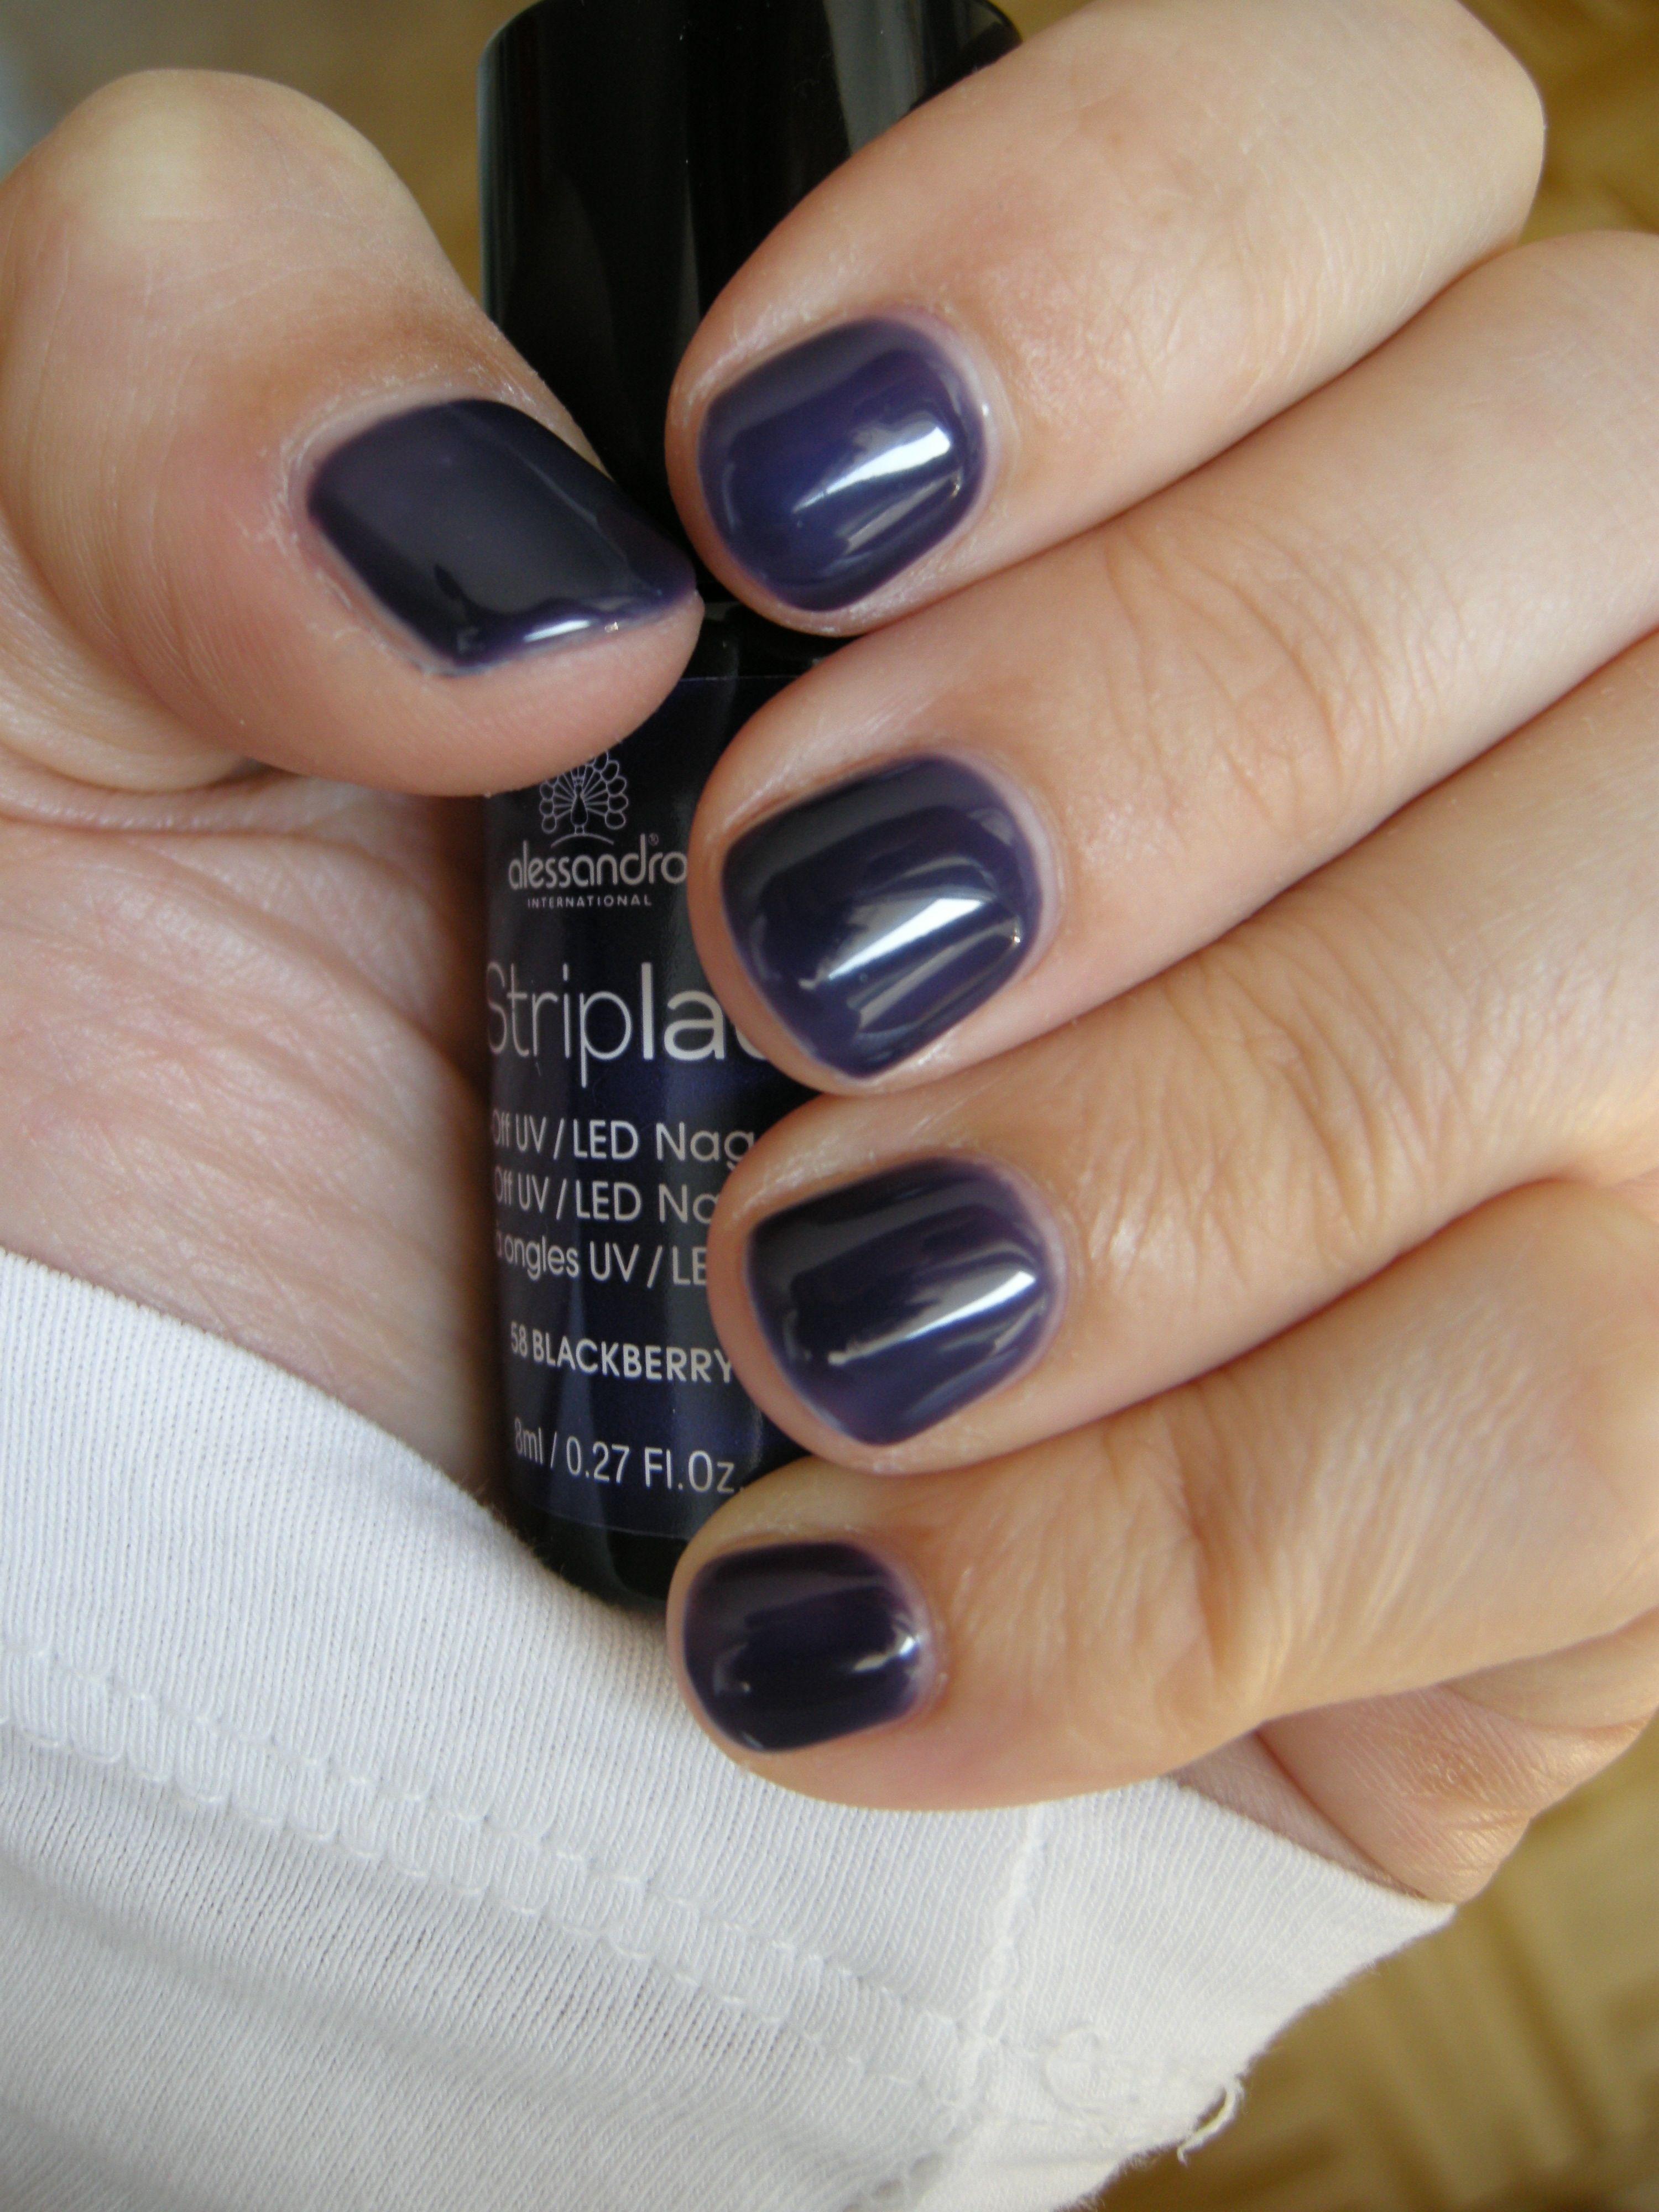 Striplac 58 Blackberry (2 coats + tiny stripe of CC Medium on the sides) #striplac